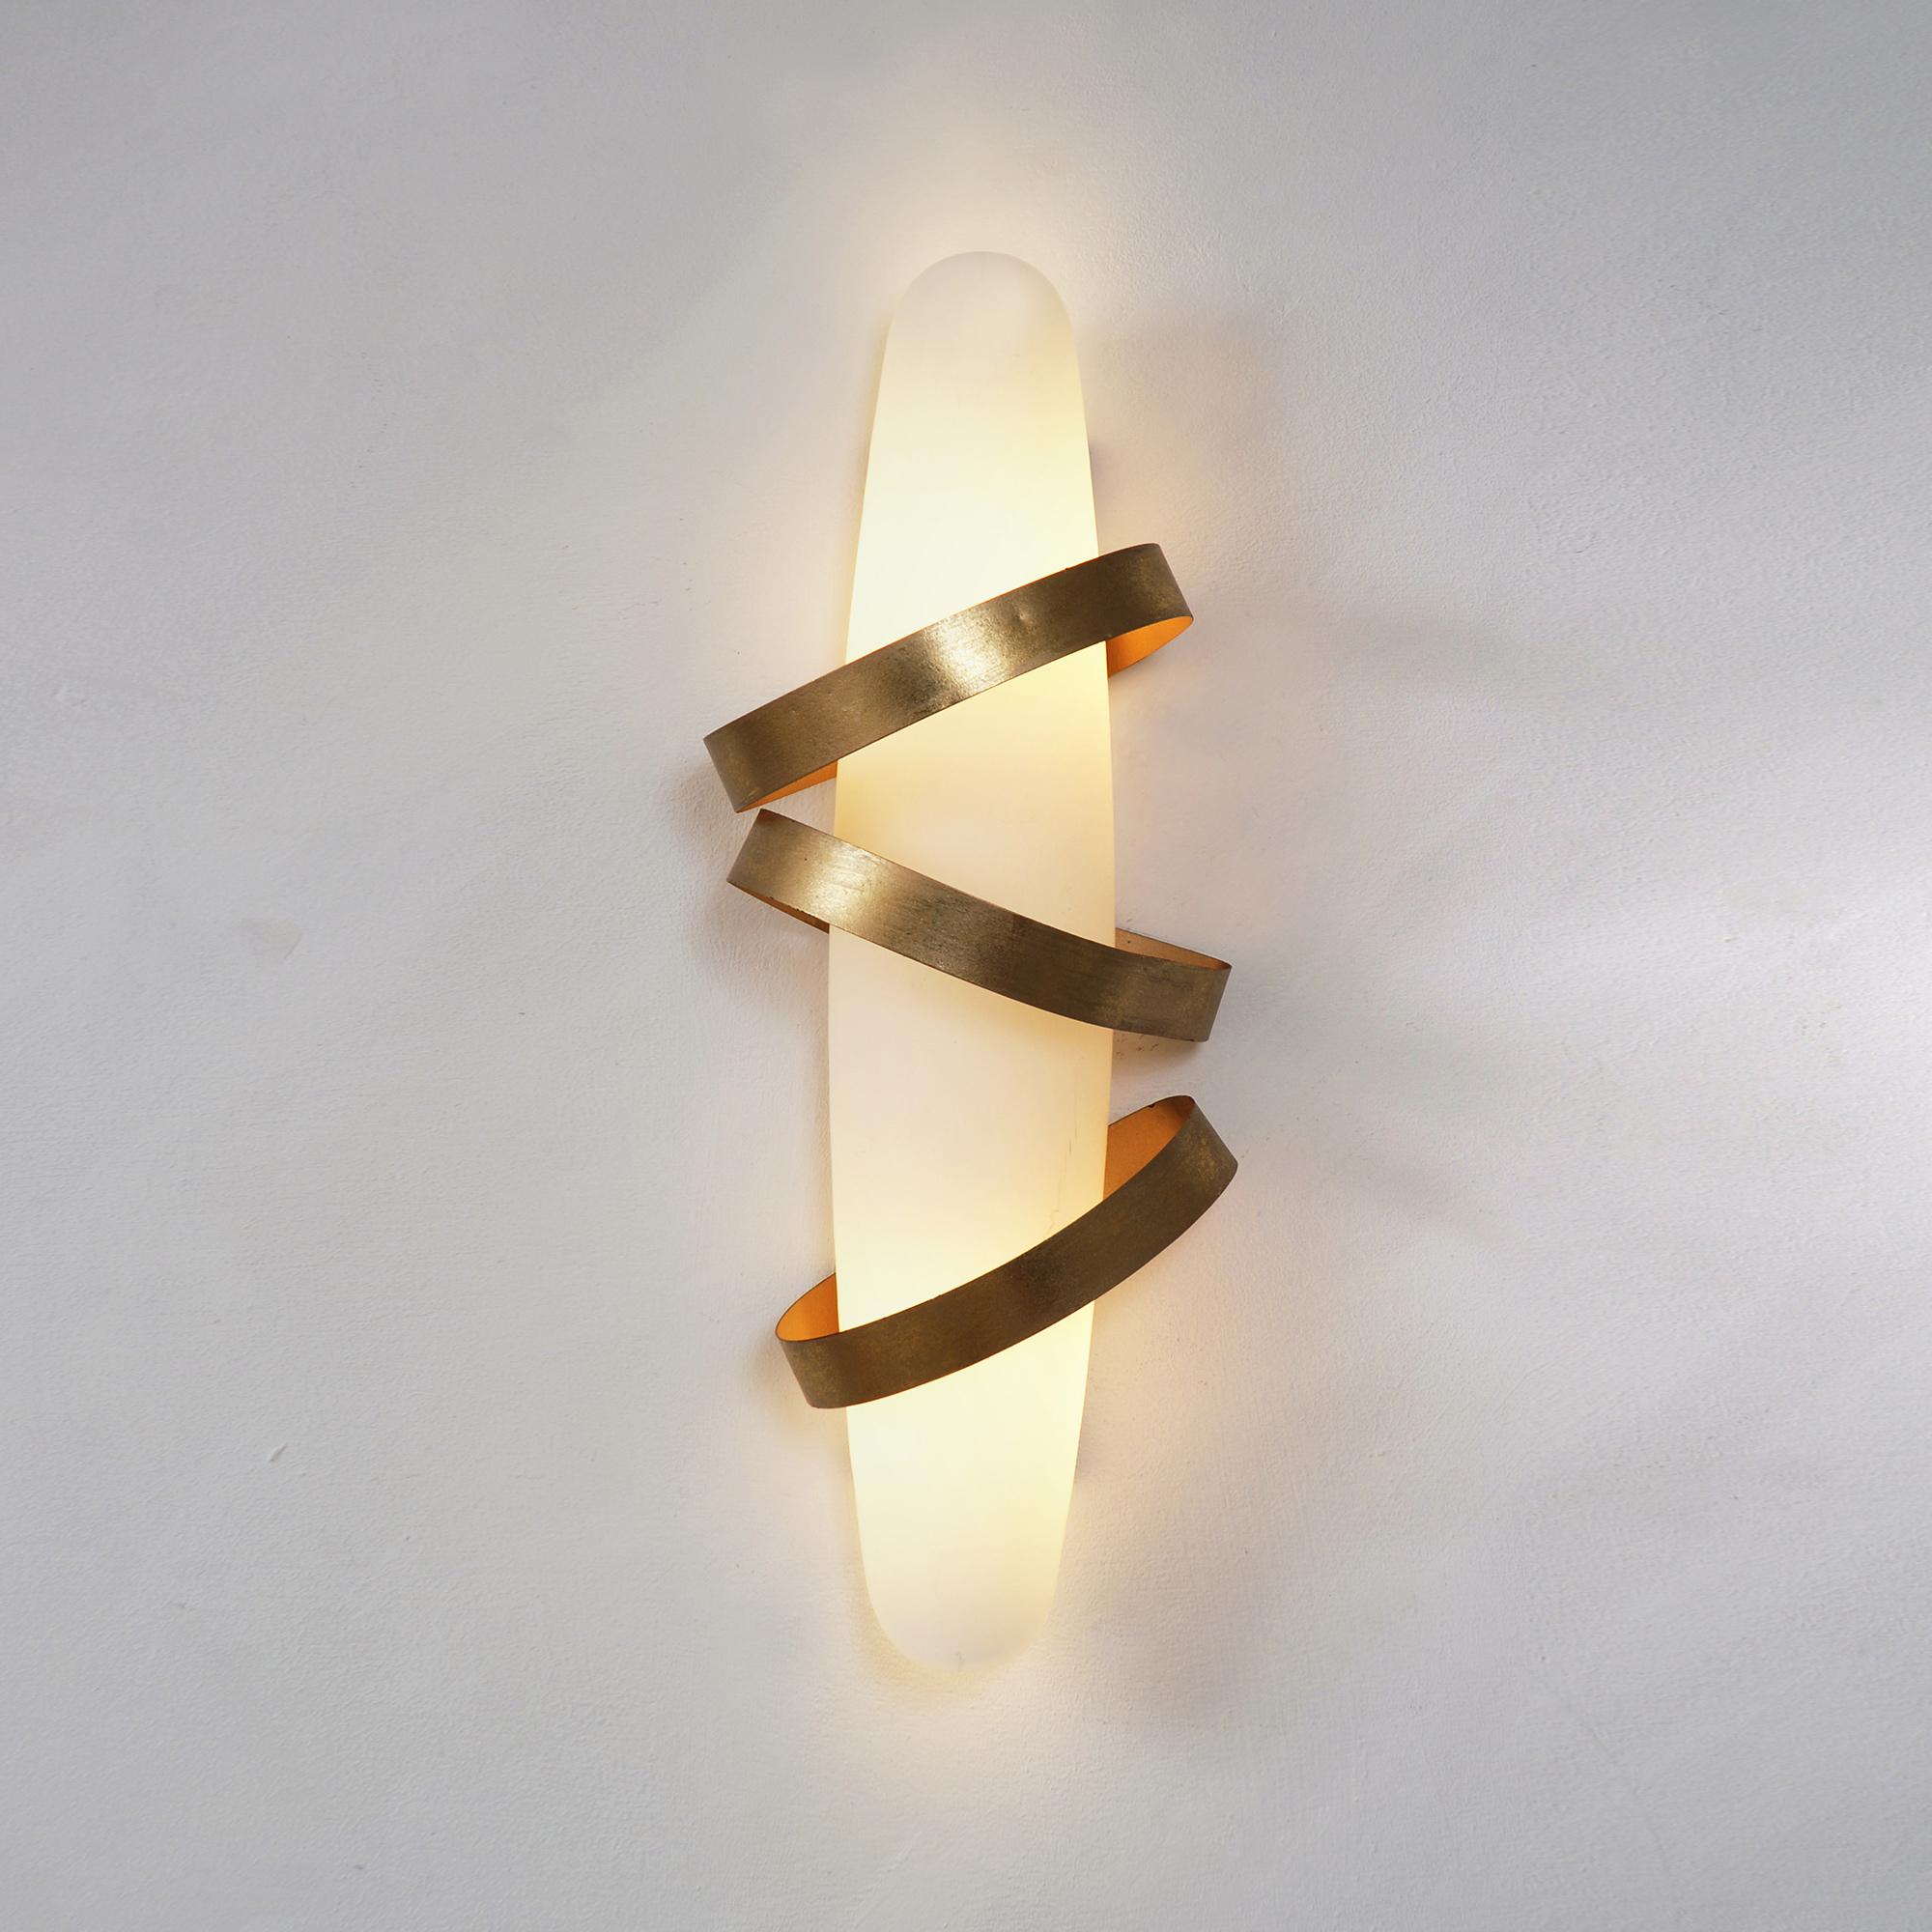 Legato Wall Light